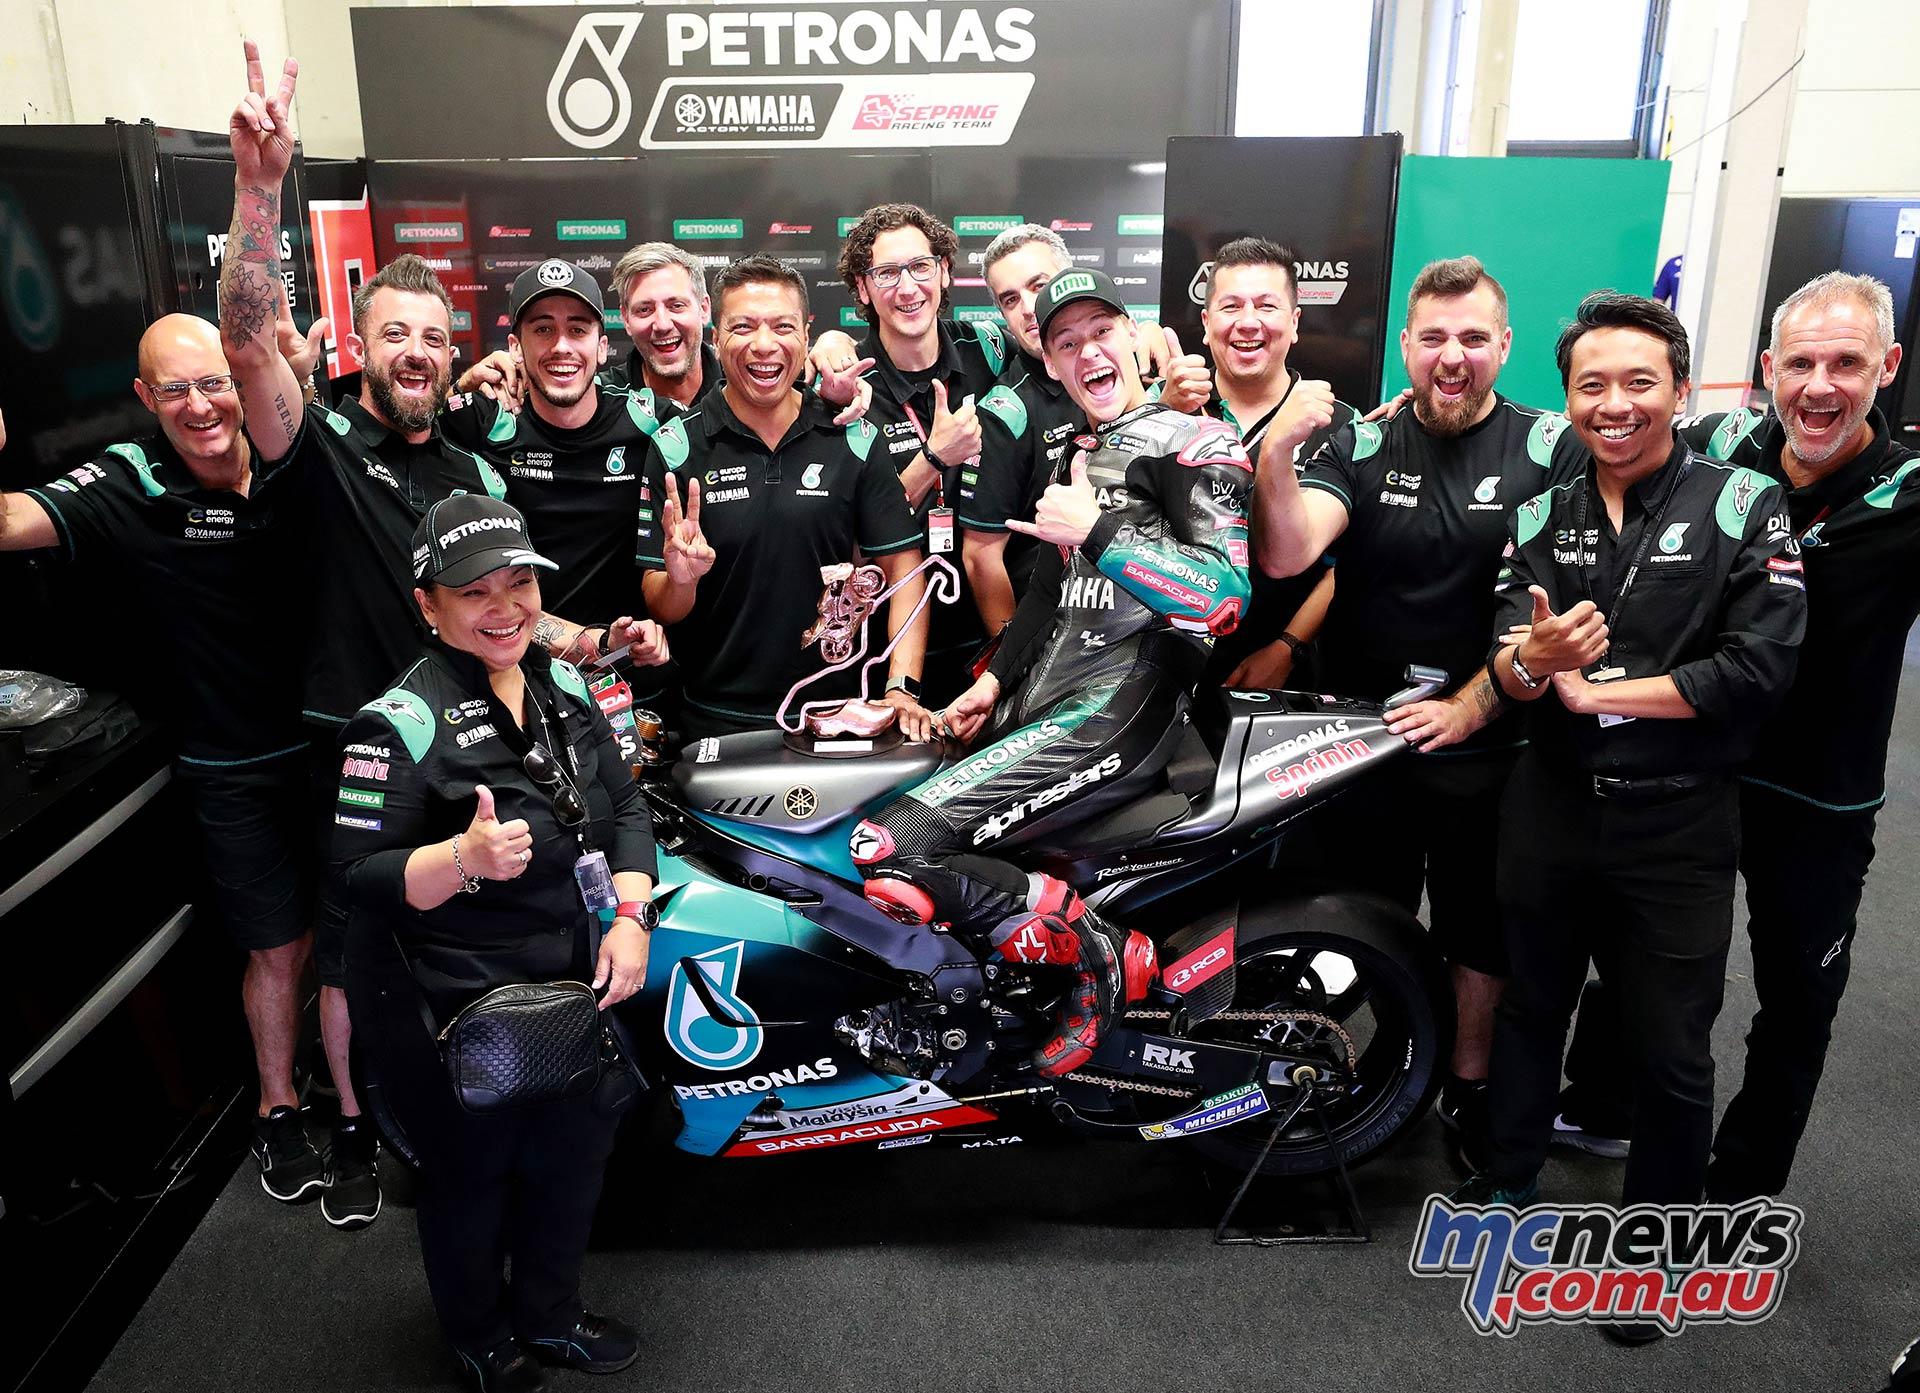 Petronas Yamaha Srt Boss On Motogp 2019 Thus Far Motorcycle News Sport And Reviews